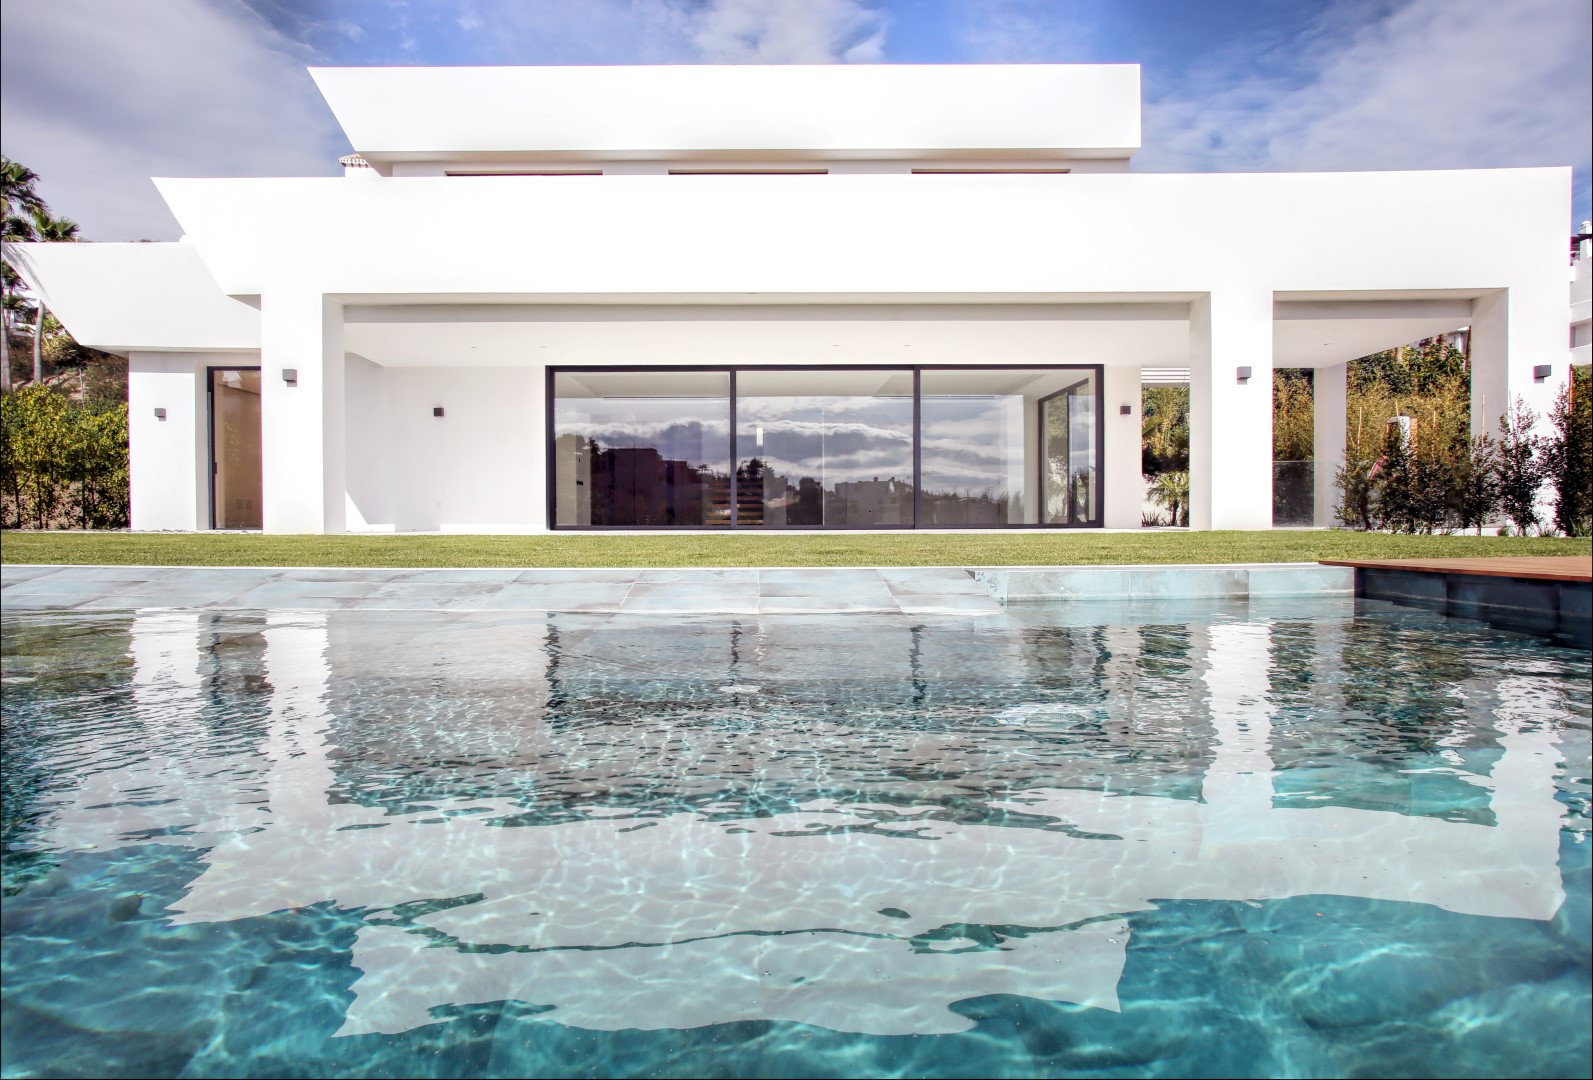 ARFV1853 - Brandneue Villa zu verkaufen in La Alqueria in Benahavis